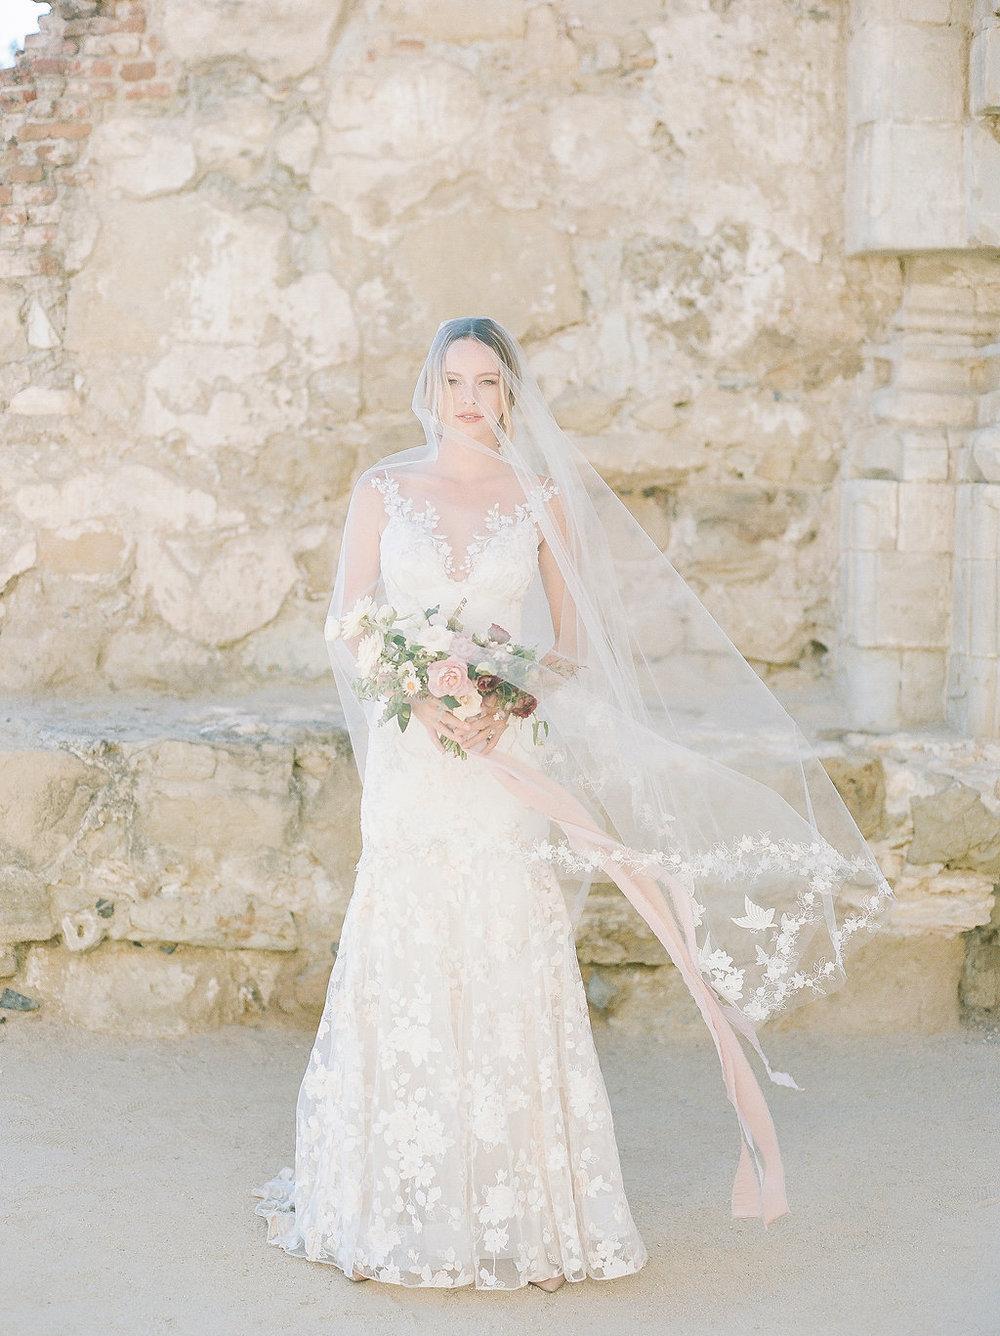 Spanish Mission Editorial |  Featured on Wedding Sparrow   San Juan Capistrano, CA